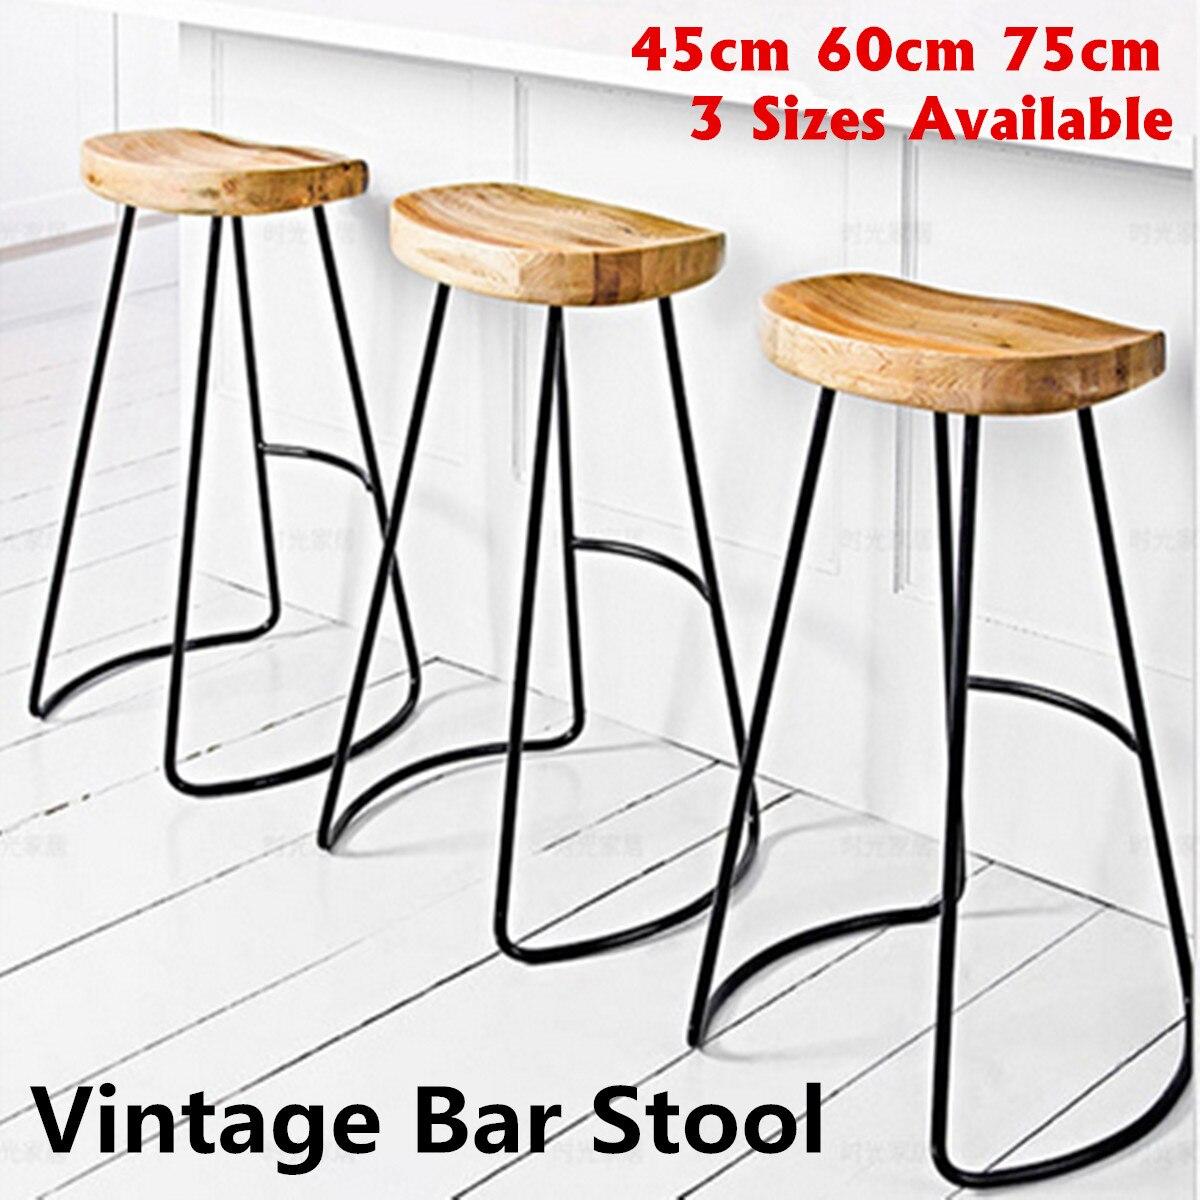 Industrial Vintage Bar Stool 45/60/75cm Retro Counter Seat Retro Pub Kitchen Metal Wood Chair Outdoor Bar Furniture Decoration toilet seat